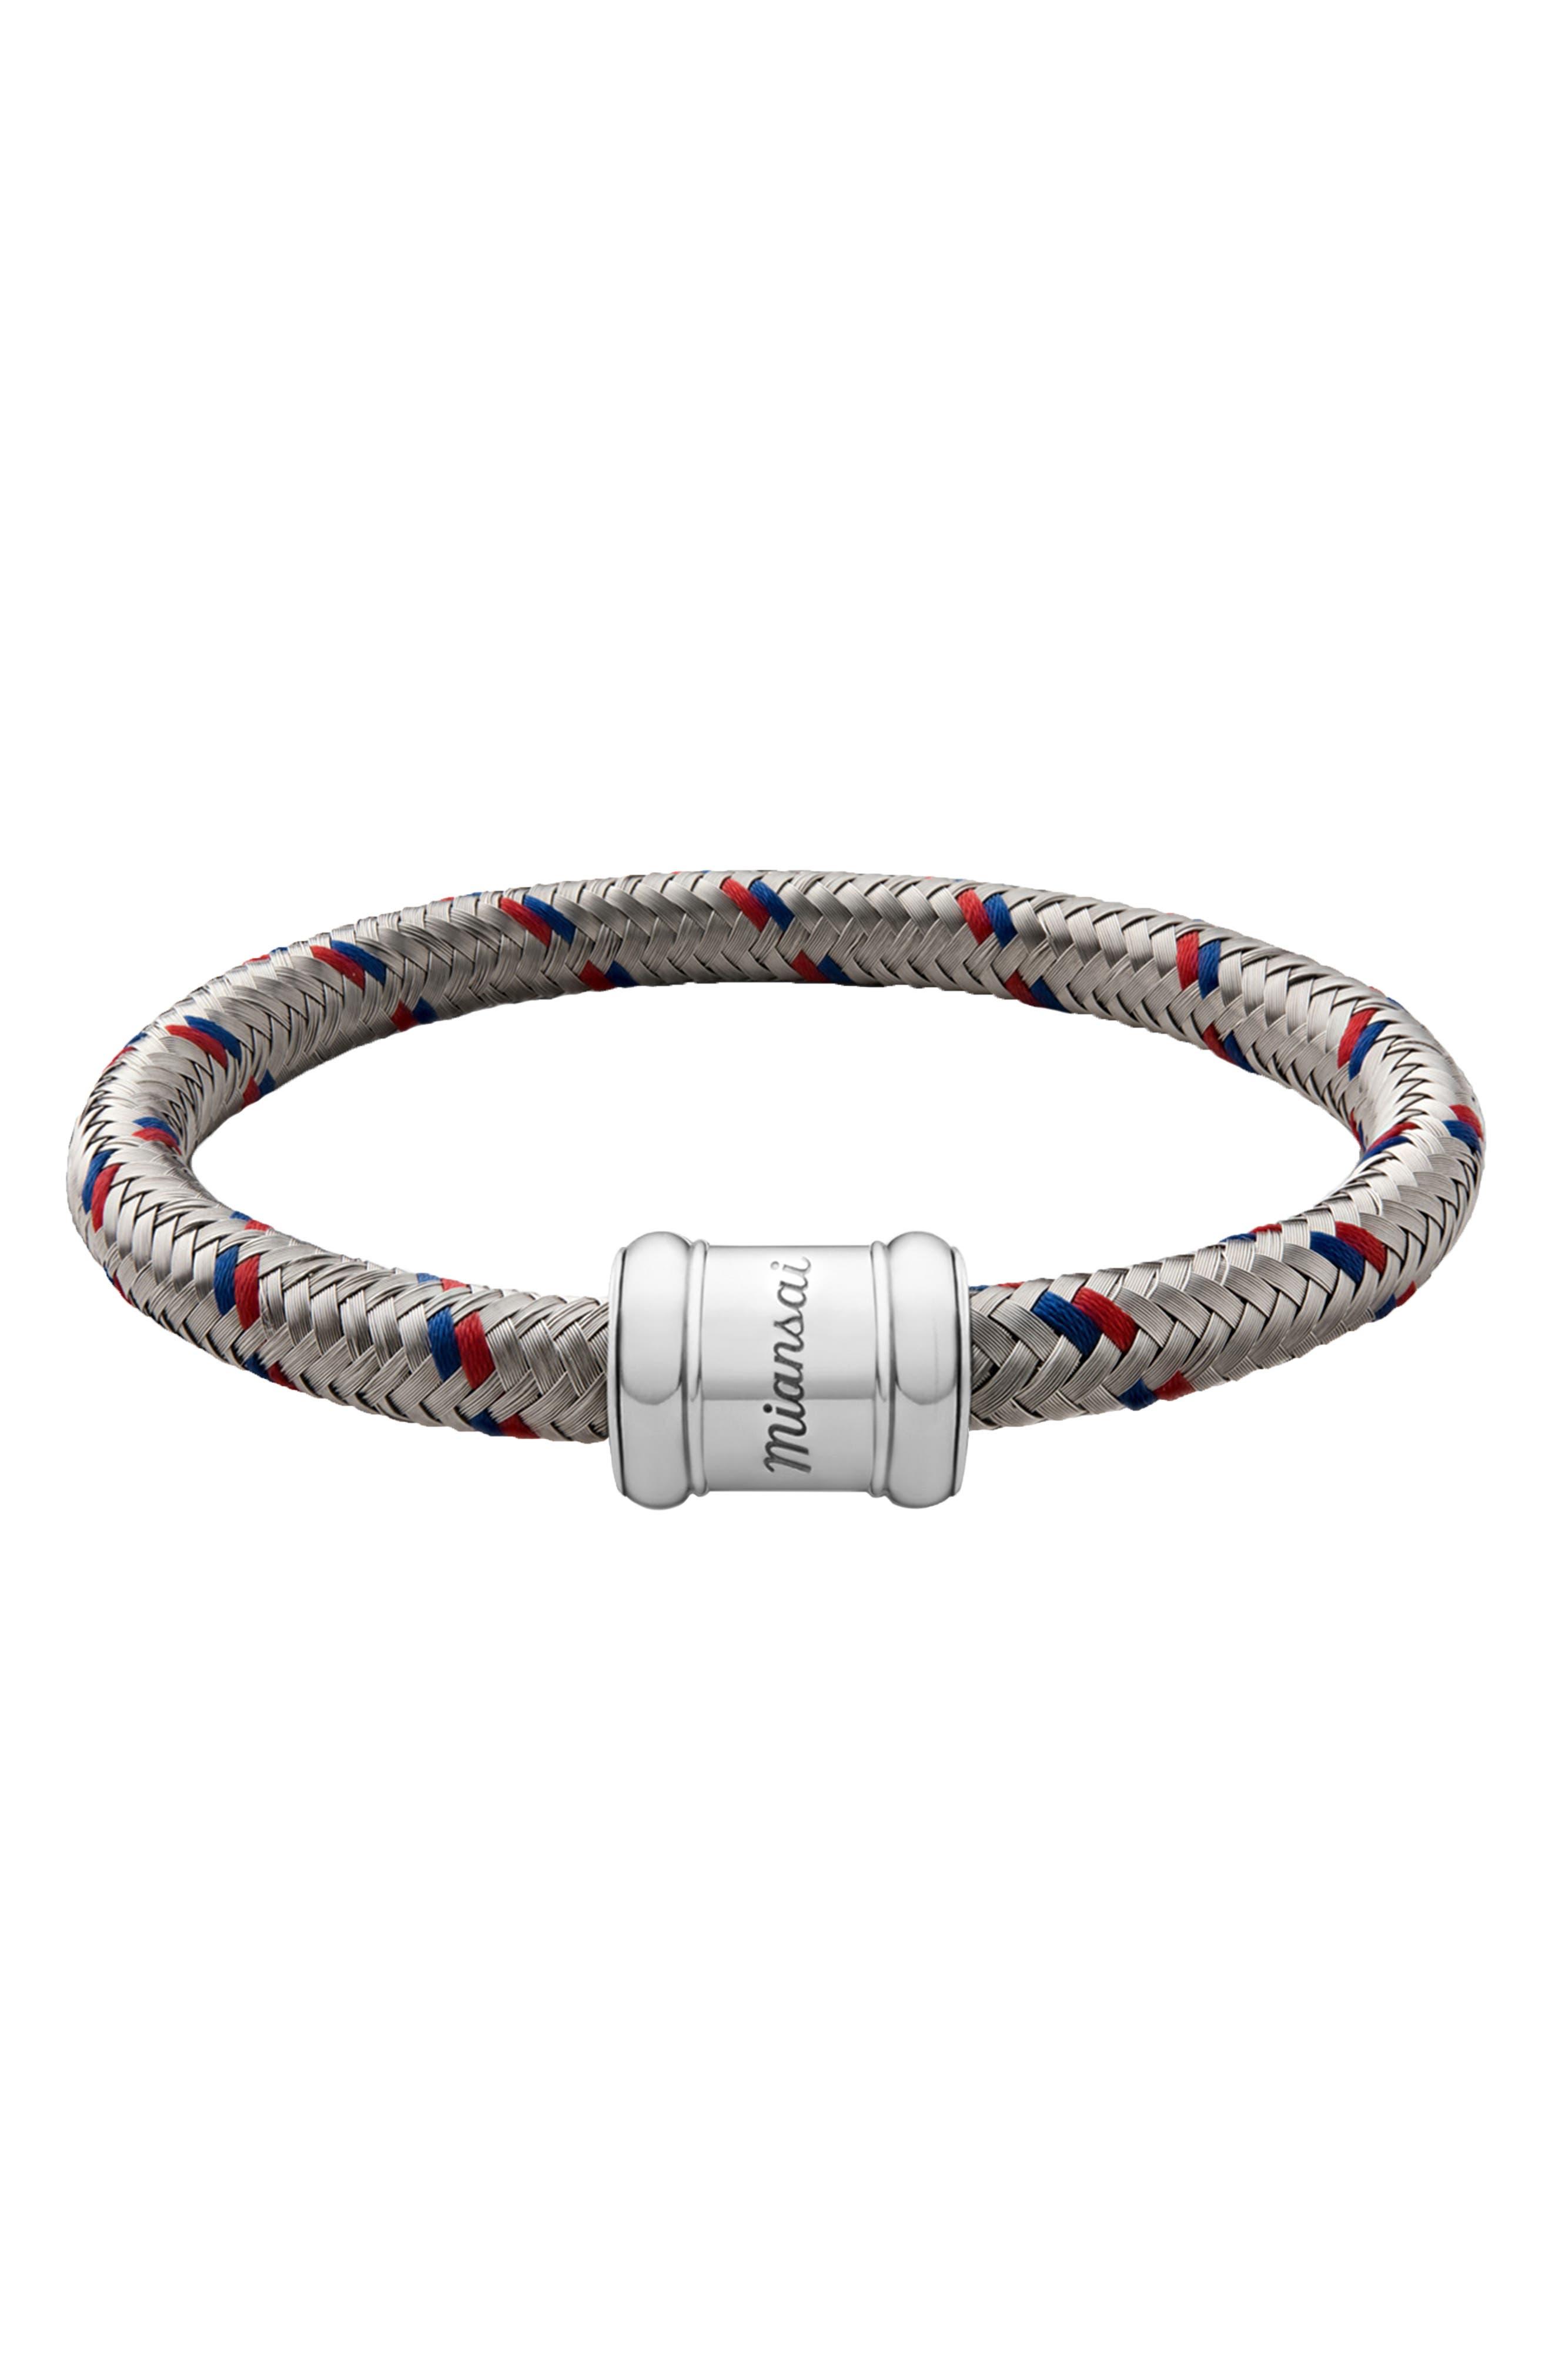 Rope Bracelet,                             Main thumbnail 1, color,                             RED/ BLUE